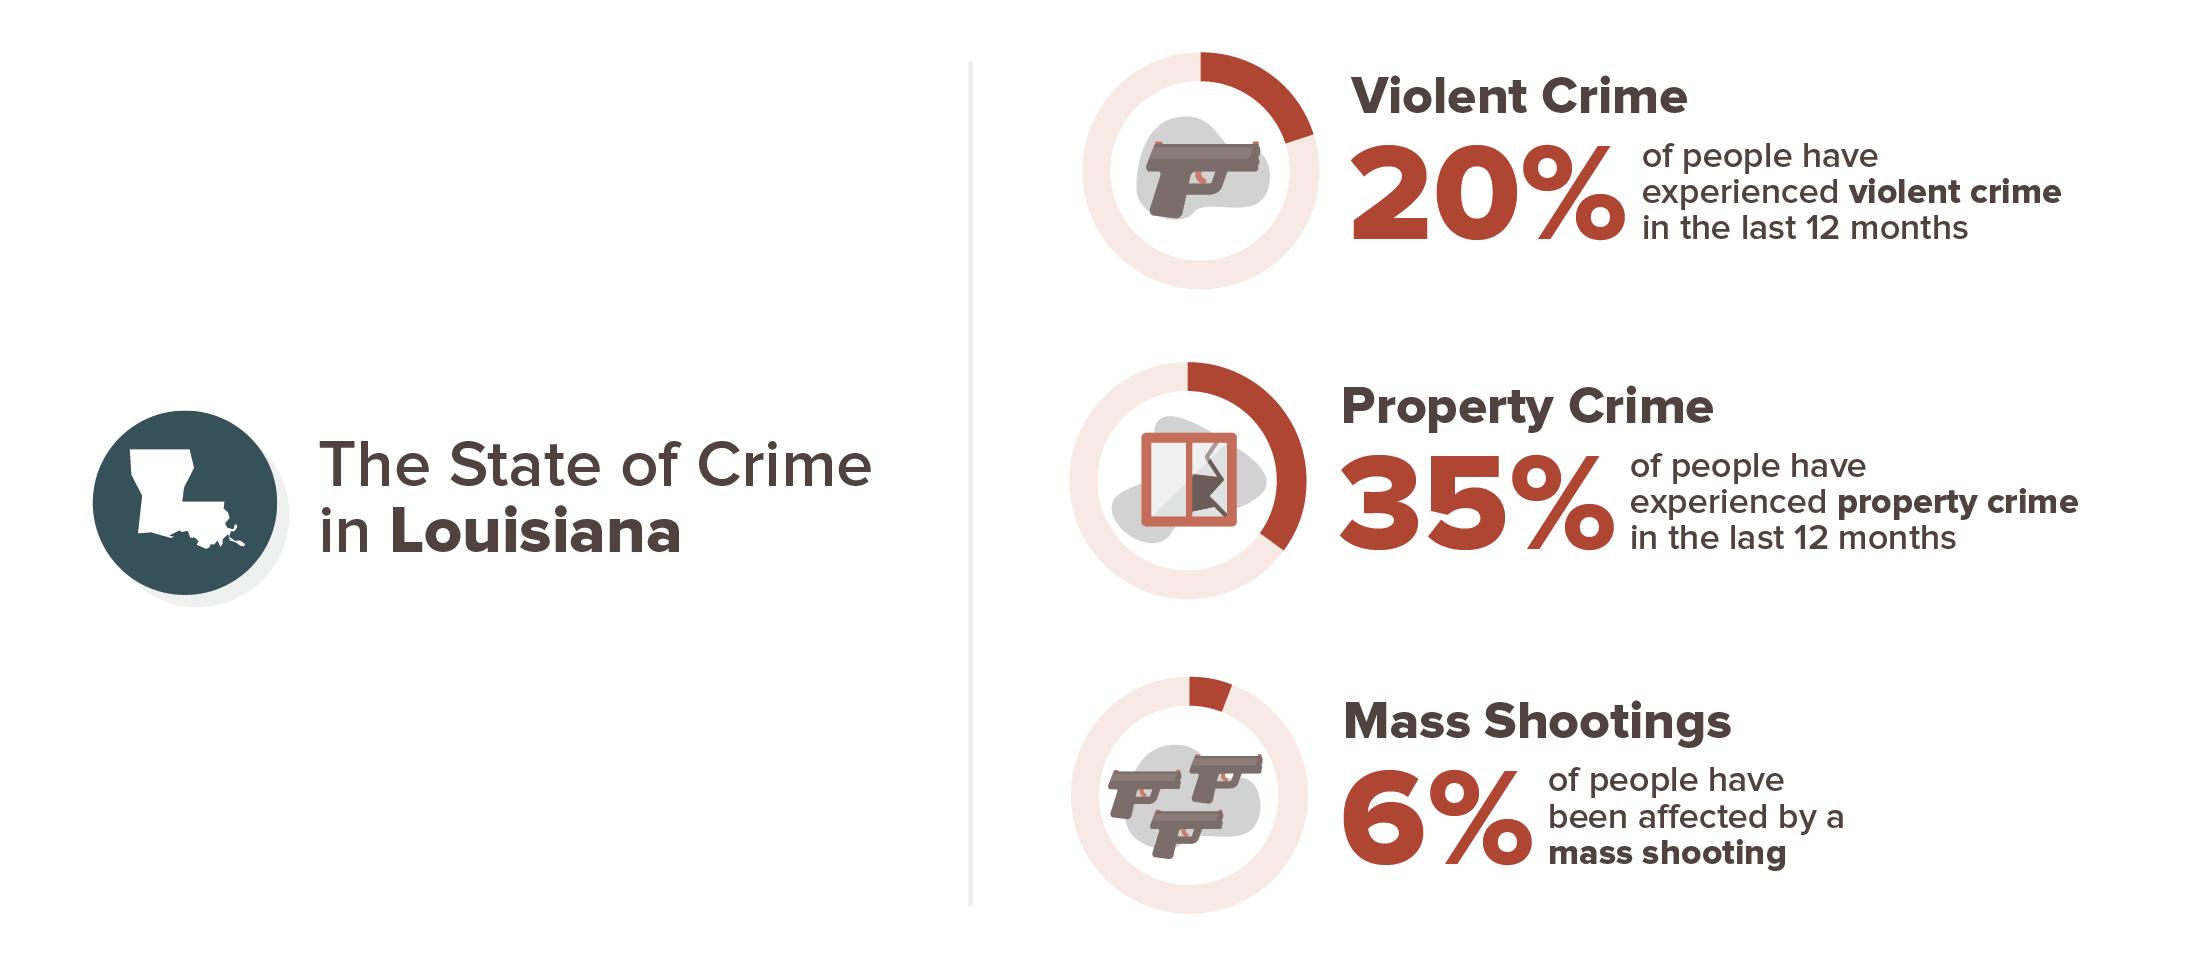 Louisiana crime experience infographic; 20% violent crime, 35% property crime, 6% mass shooting